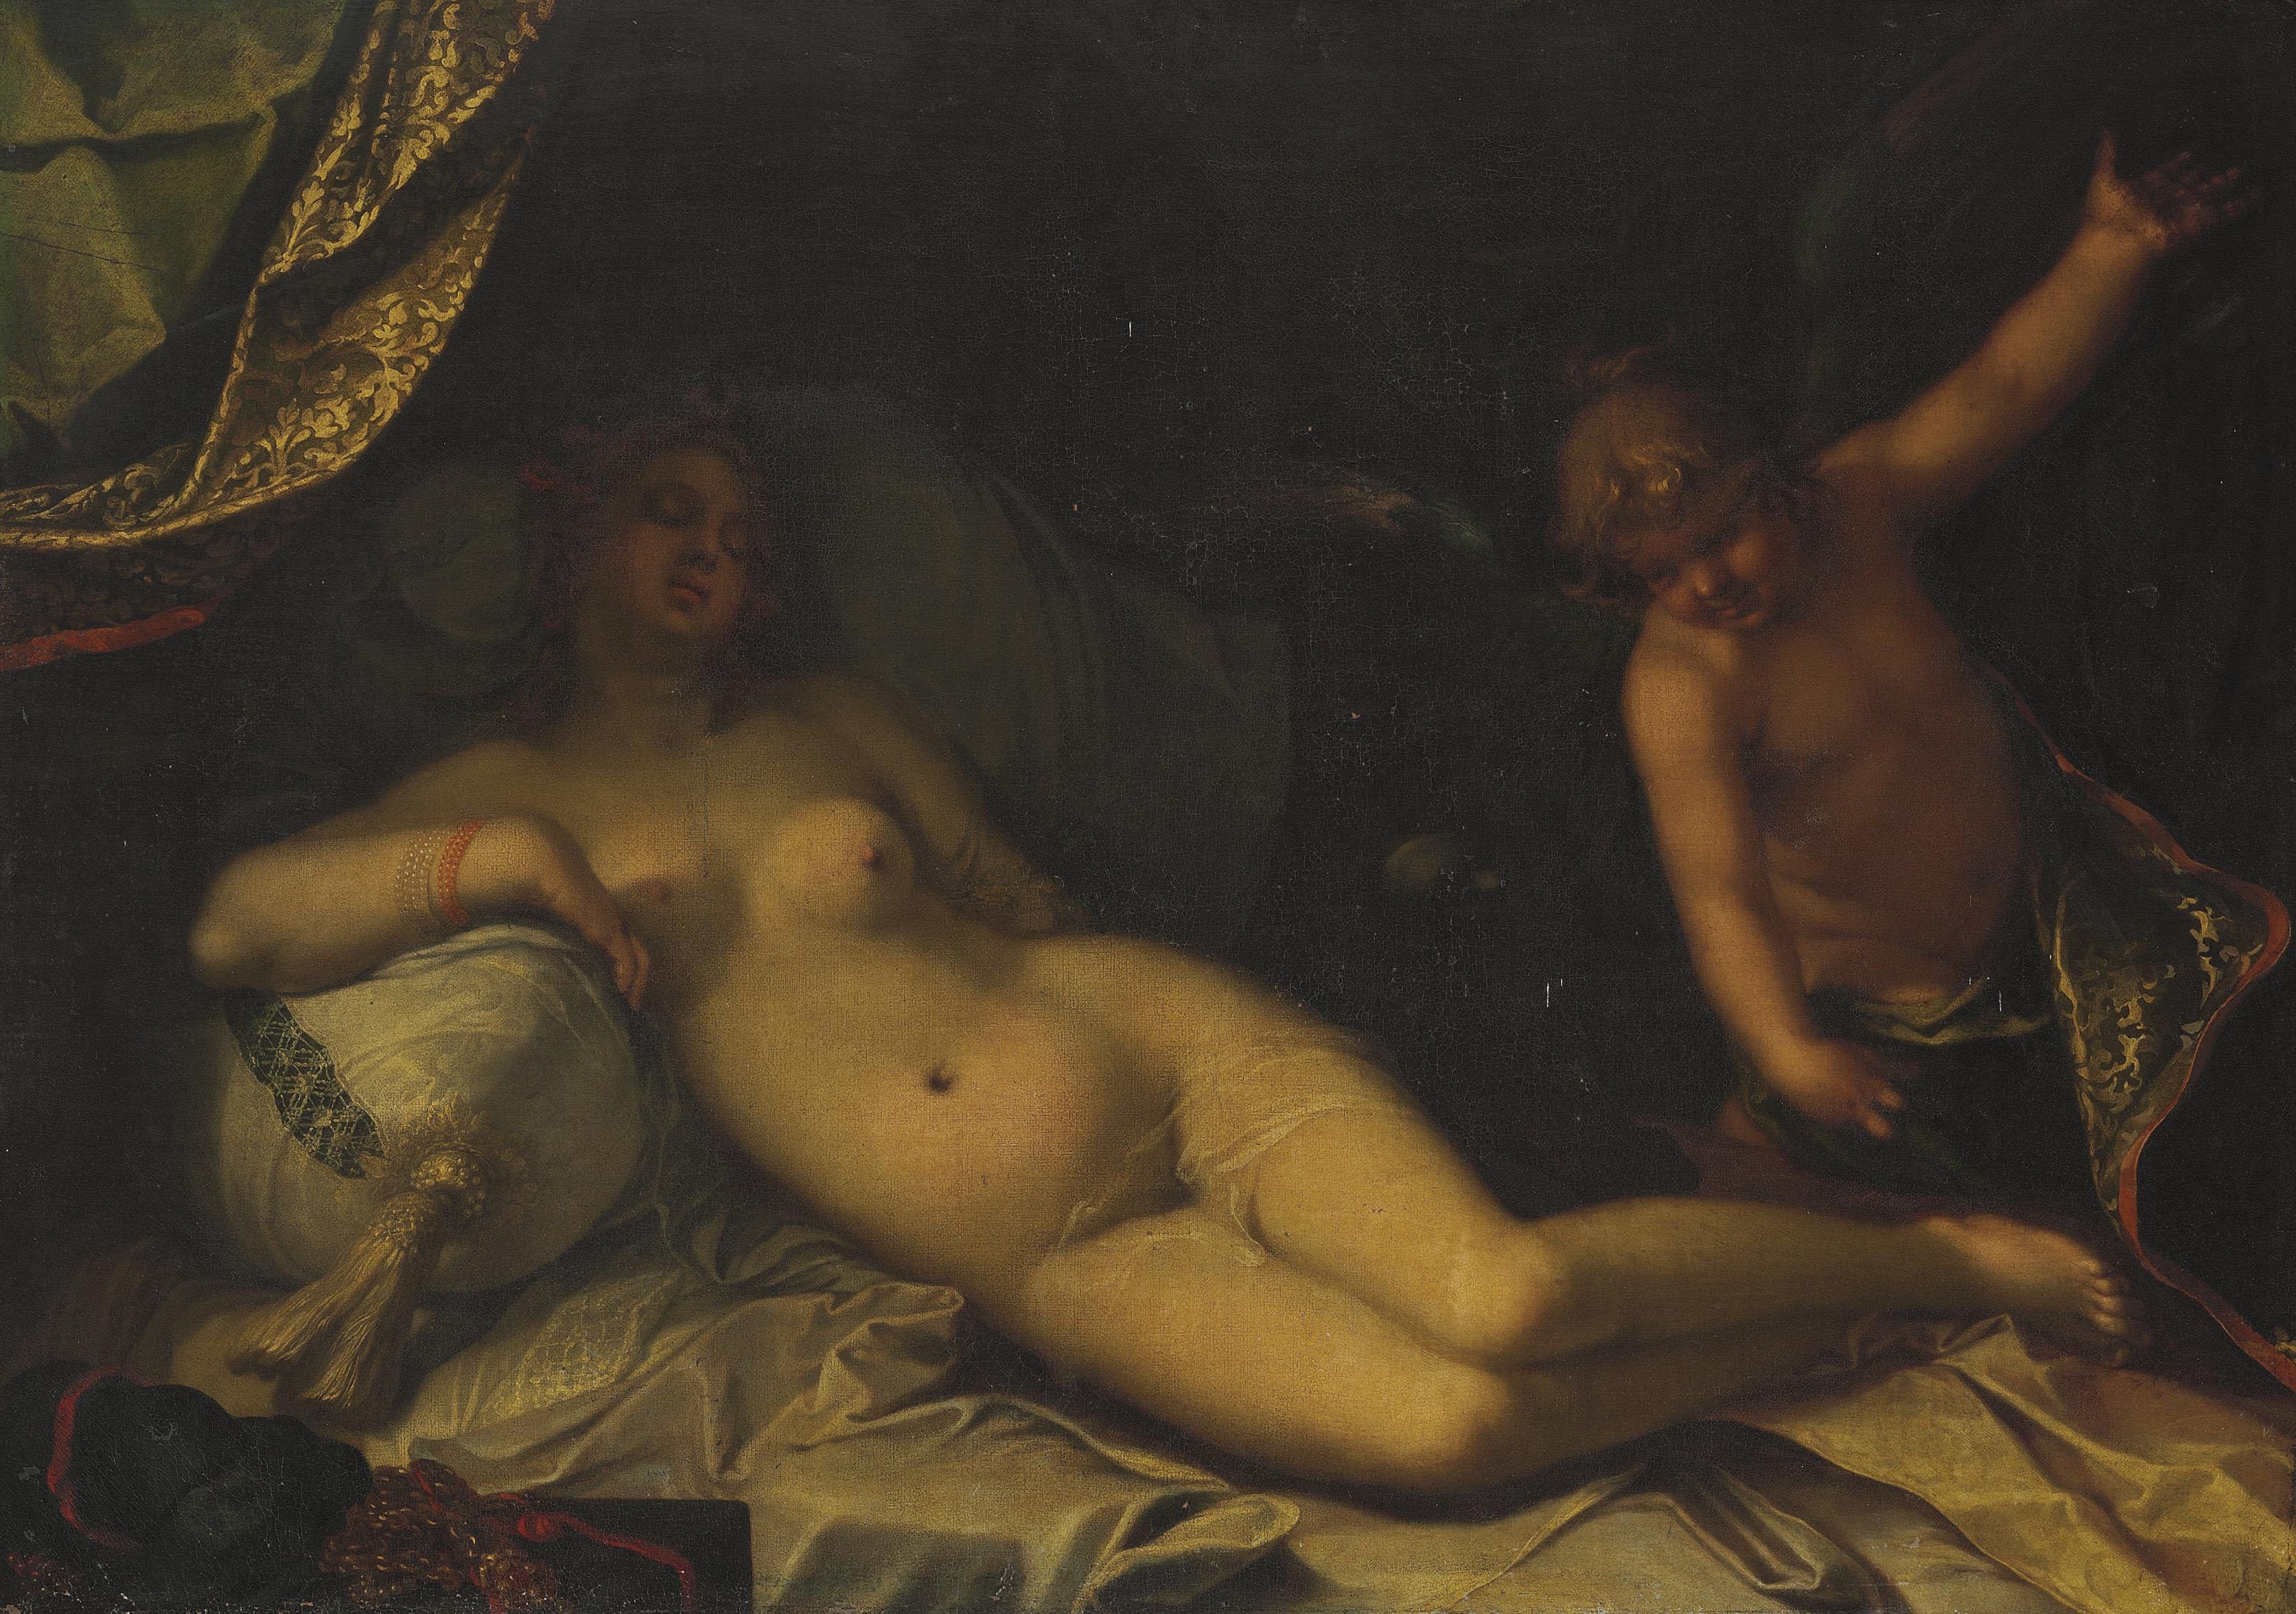 A mythological scene, perhaps Venus and Cupid